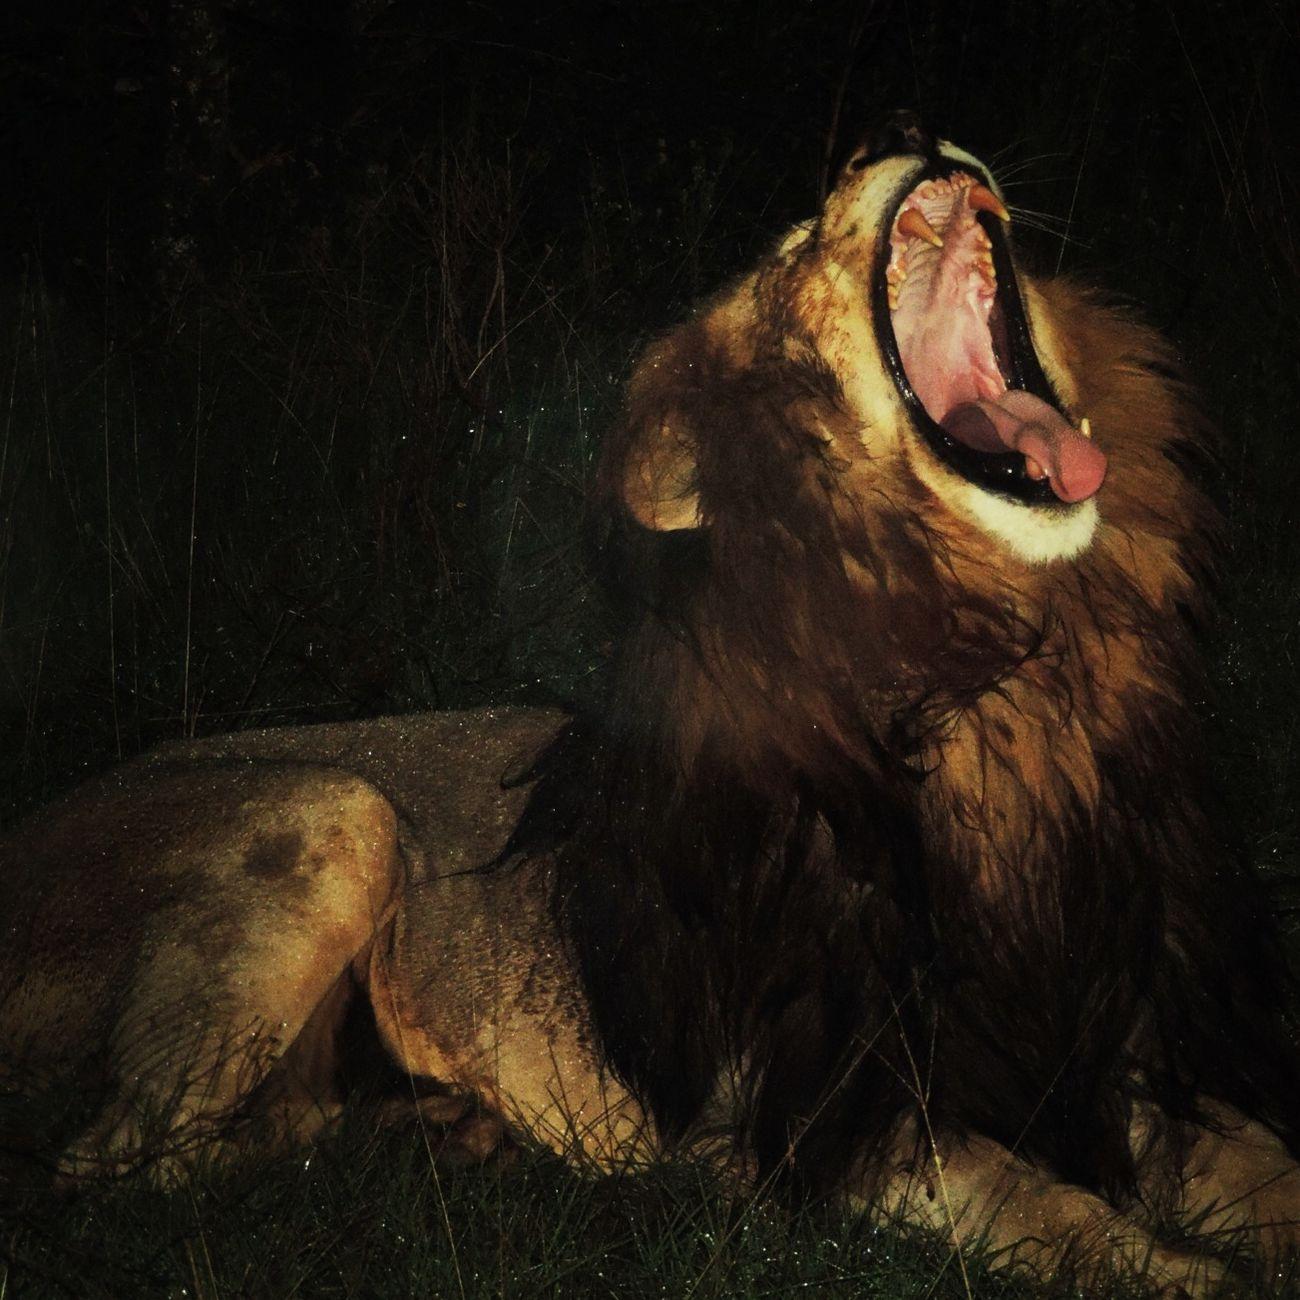 Leon Lindo Gatito Increible esperiencia. Safari en Sudáfrica